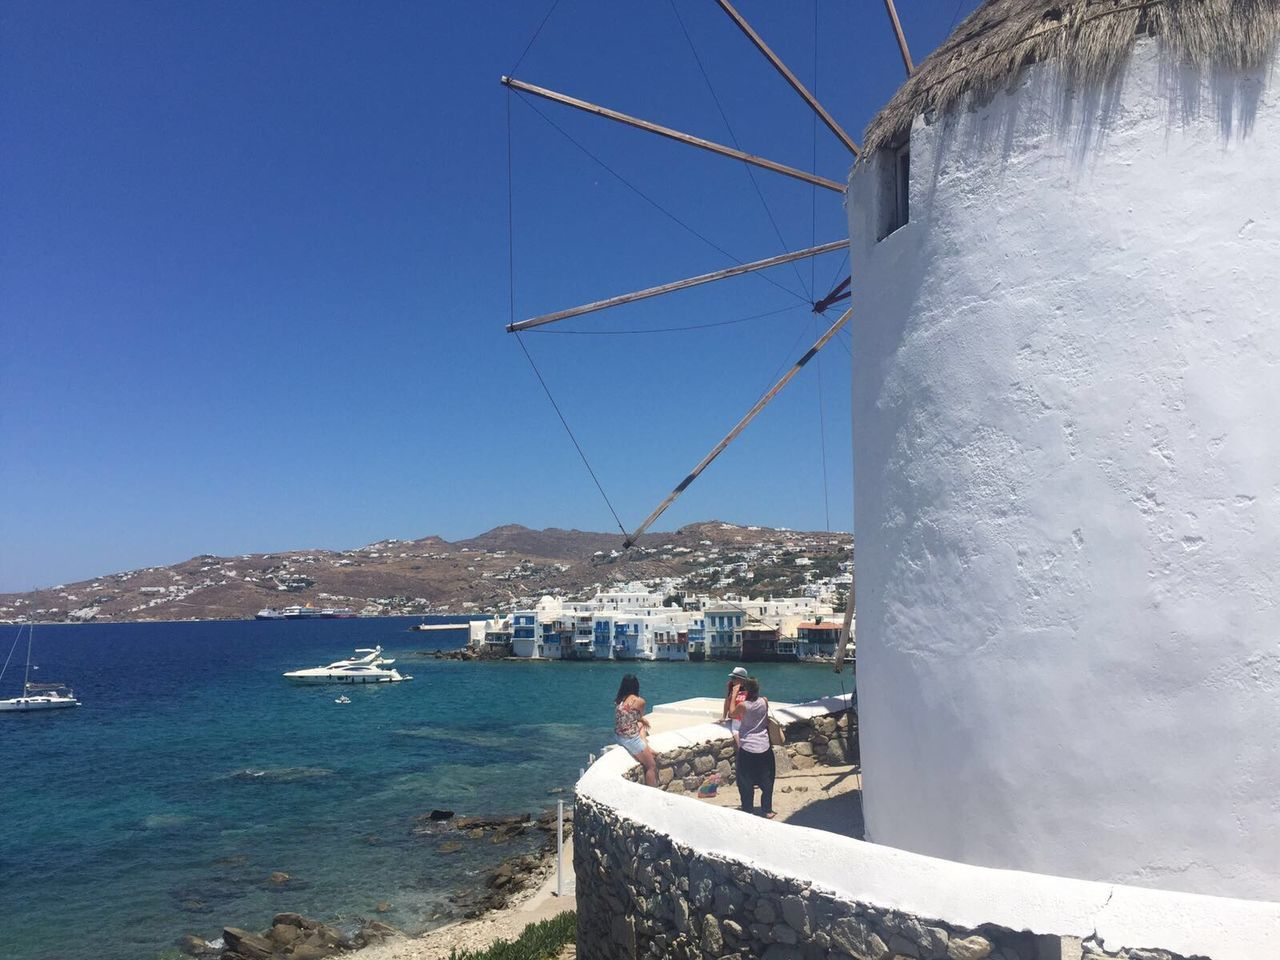 Traveling Travelphotography Cyclades Islands Mykonostown Windmill Best Destination Greece Europe